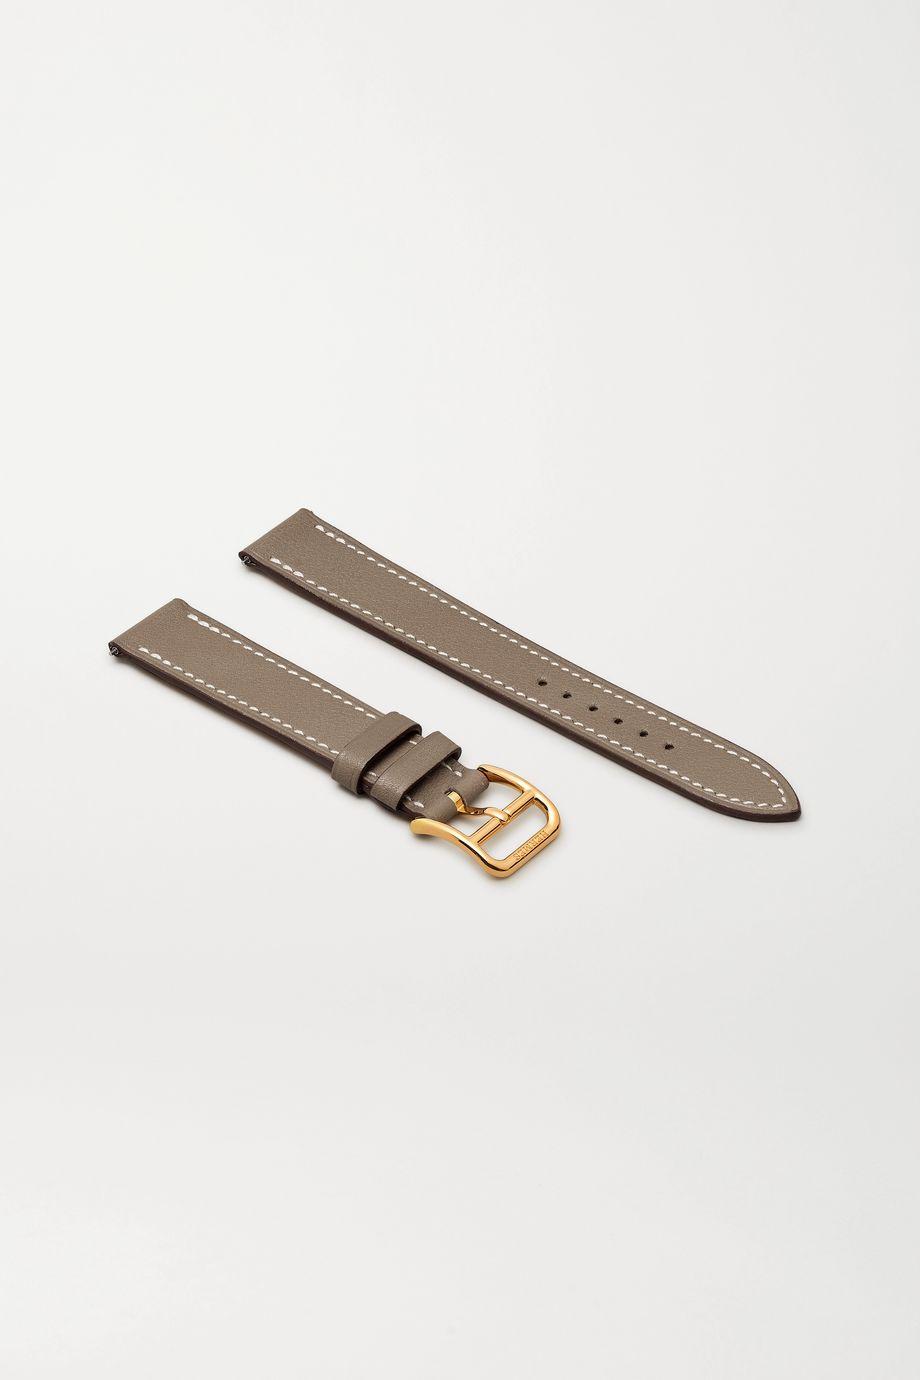 Hermès Timepieces Heure H Double Jeu 21mm leather watch strap